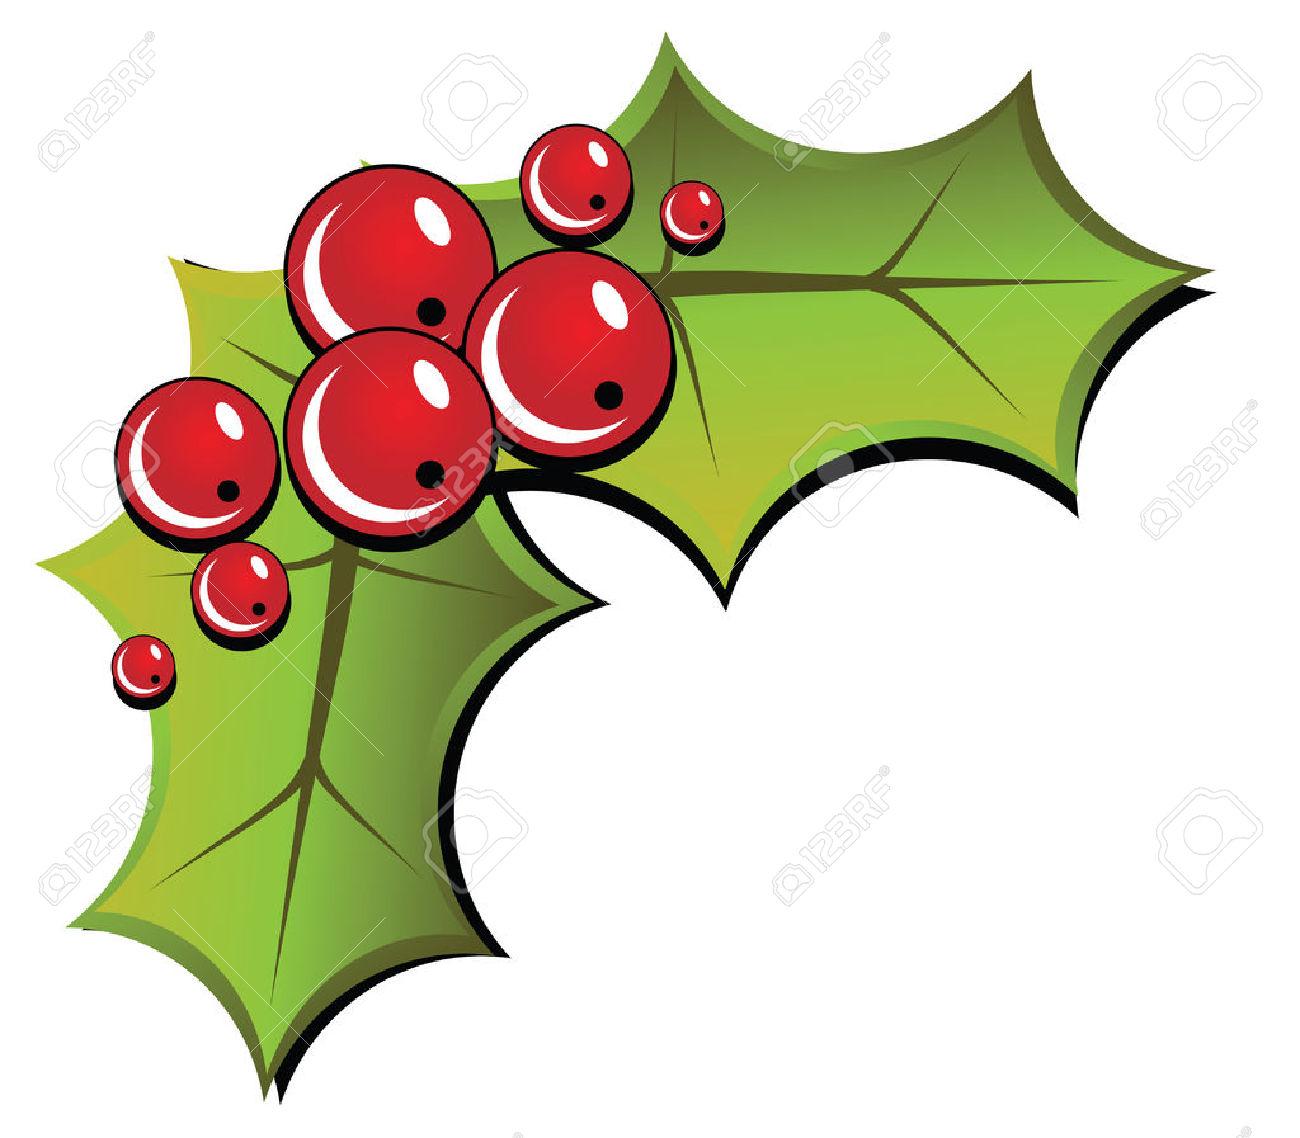 Christmas Holly Isolated On White Background. Illustration.